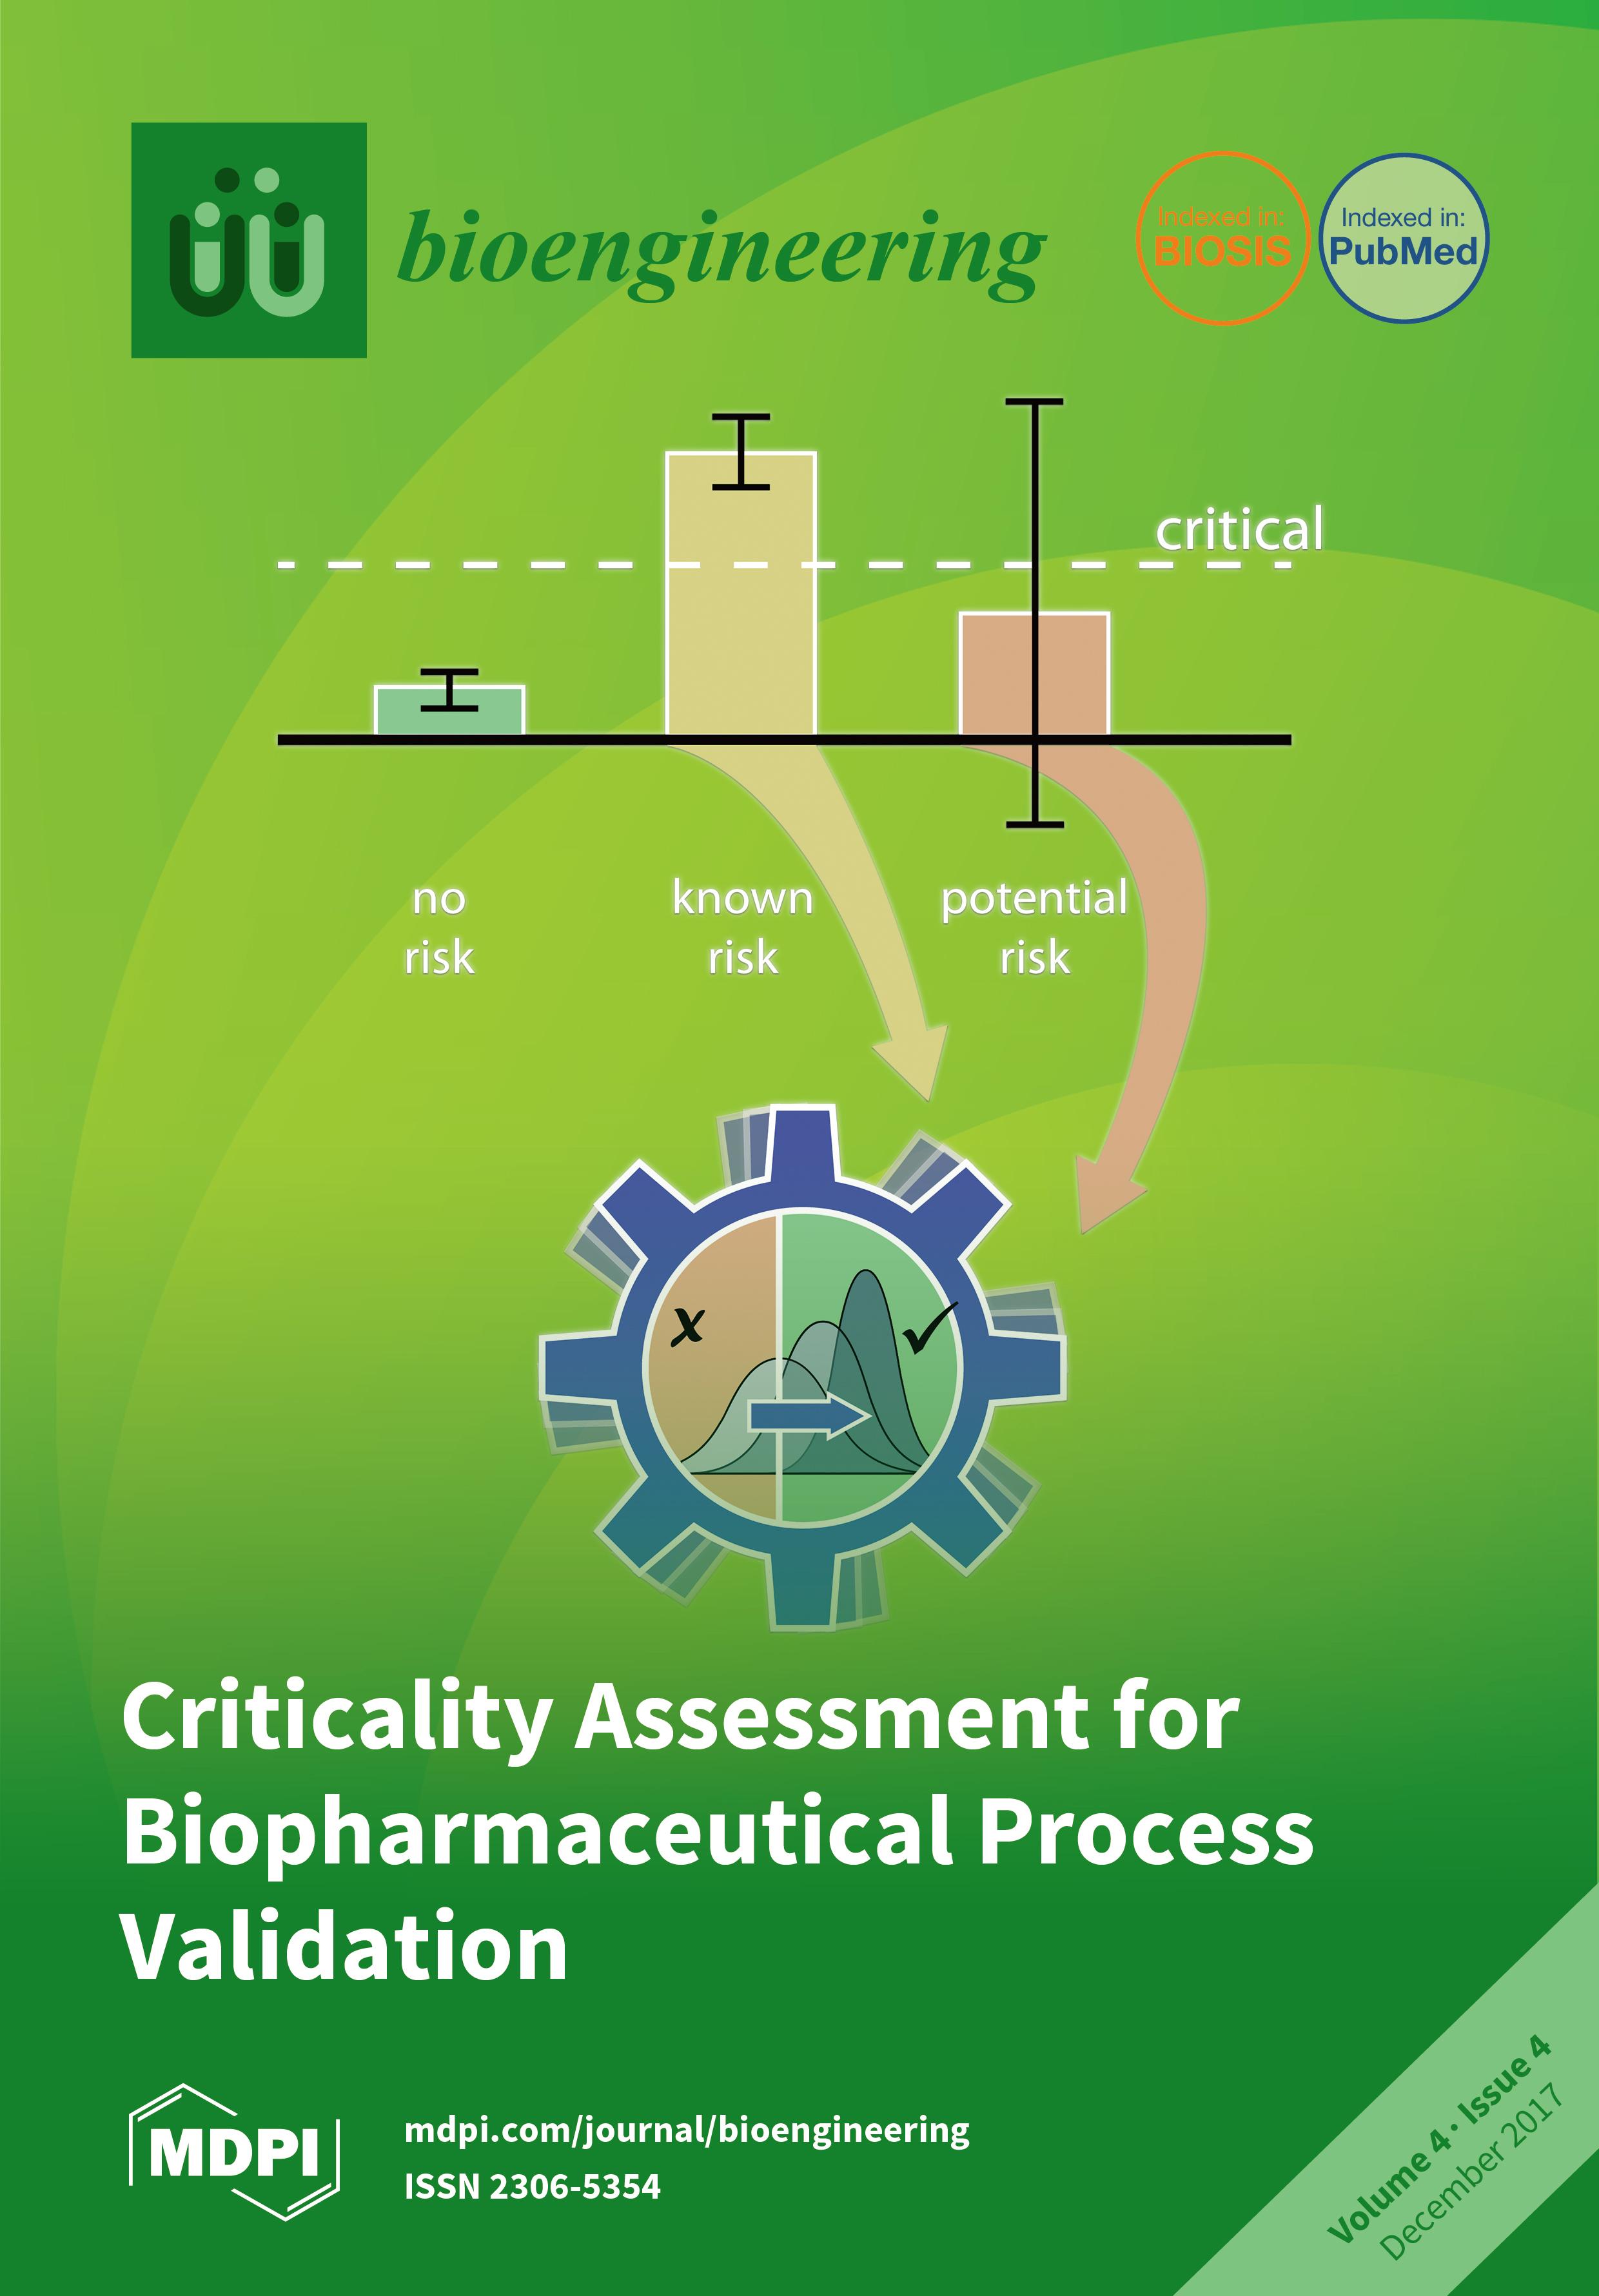 process validation in pharma